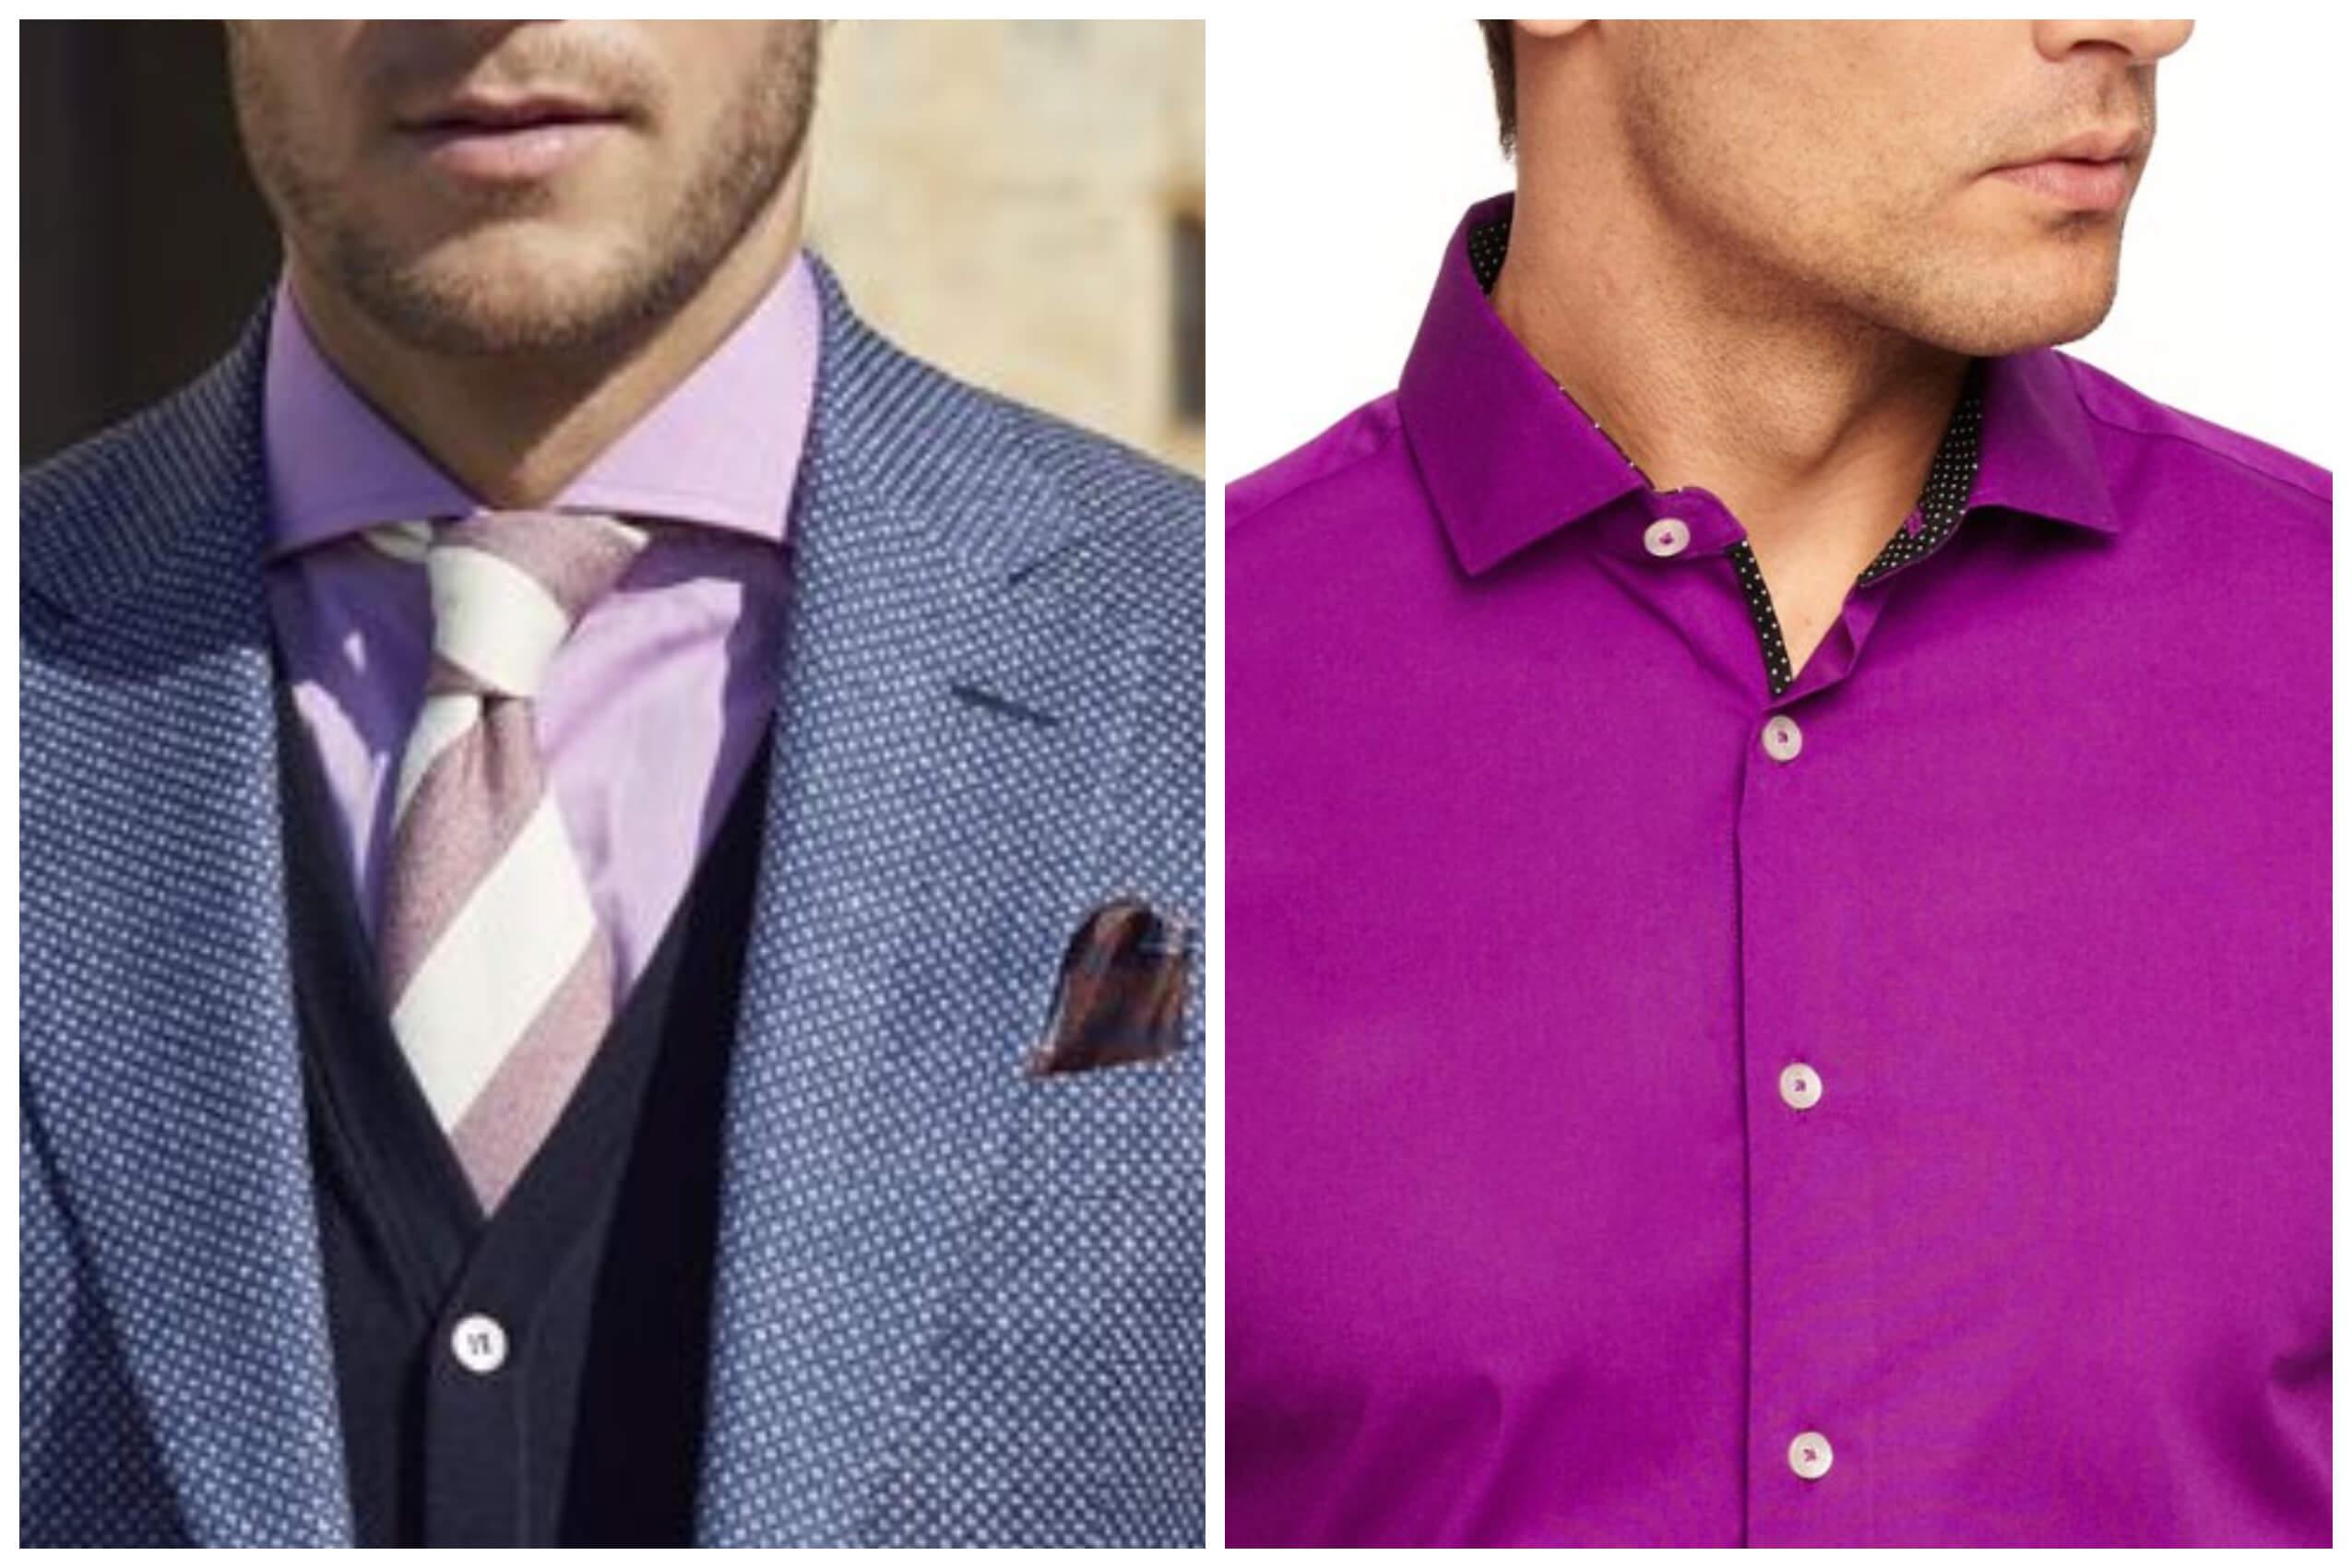 How To Wear Purple As A Menswear Color Gentleman S Gazette,Ikea Hack Learning Tower Dimensions